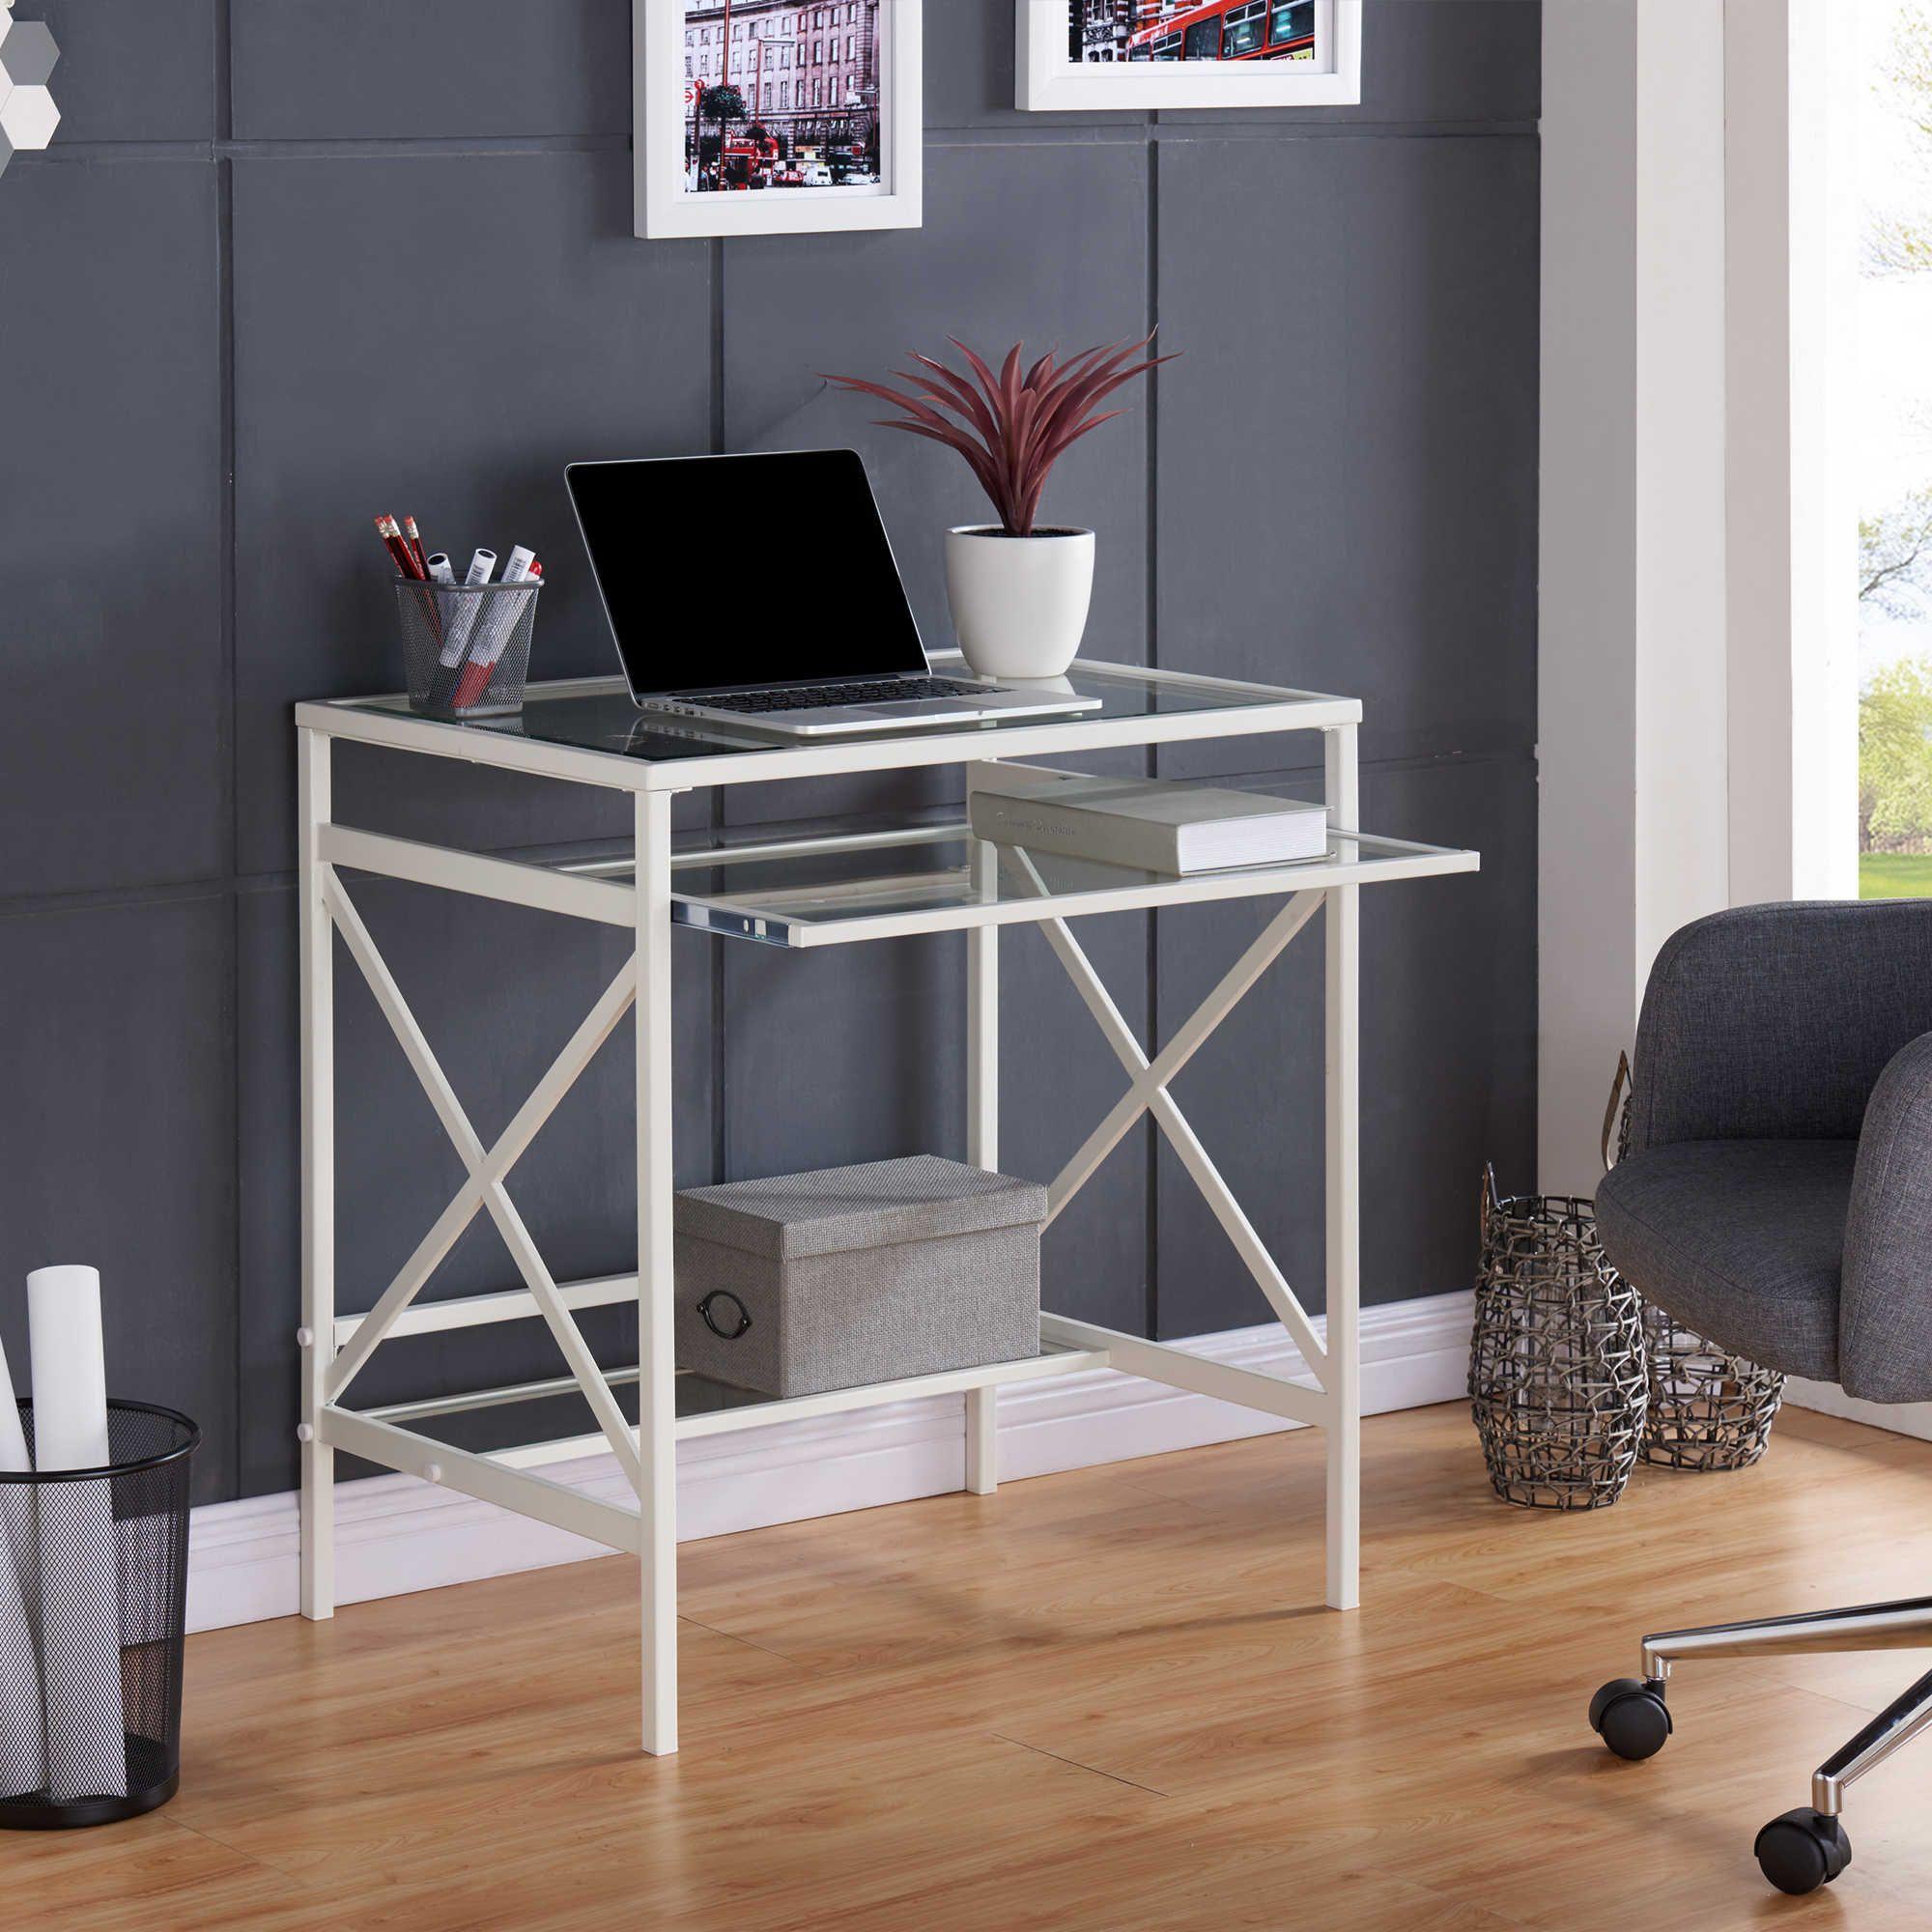 Southern enterprises elvan metalglass smallspace desk in white